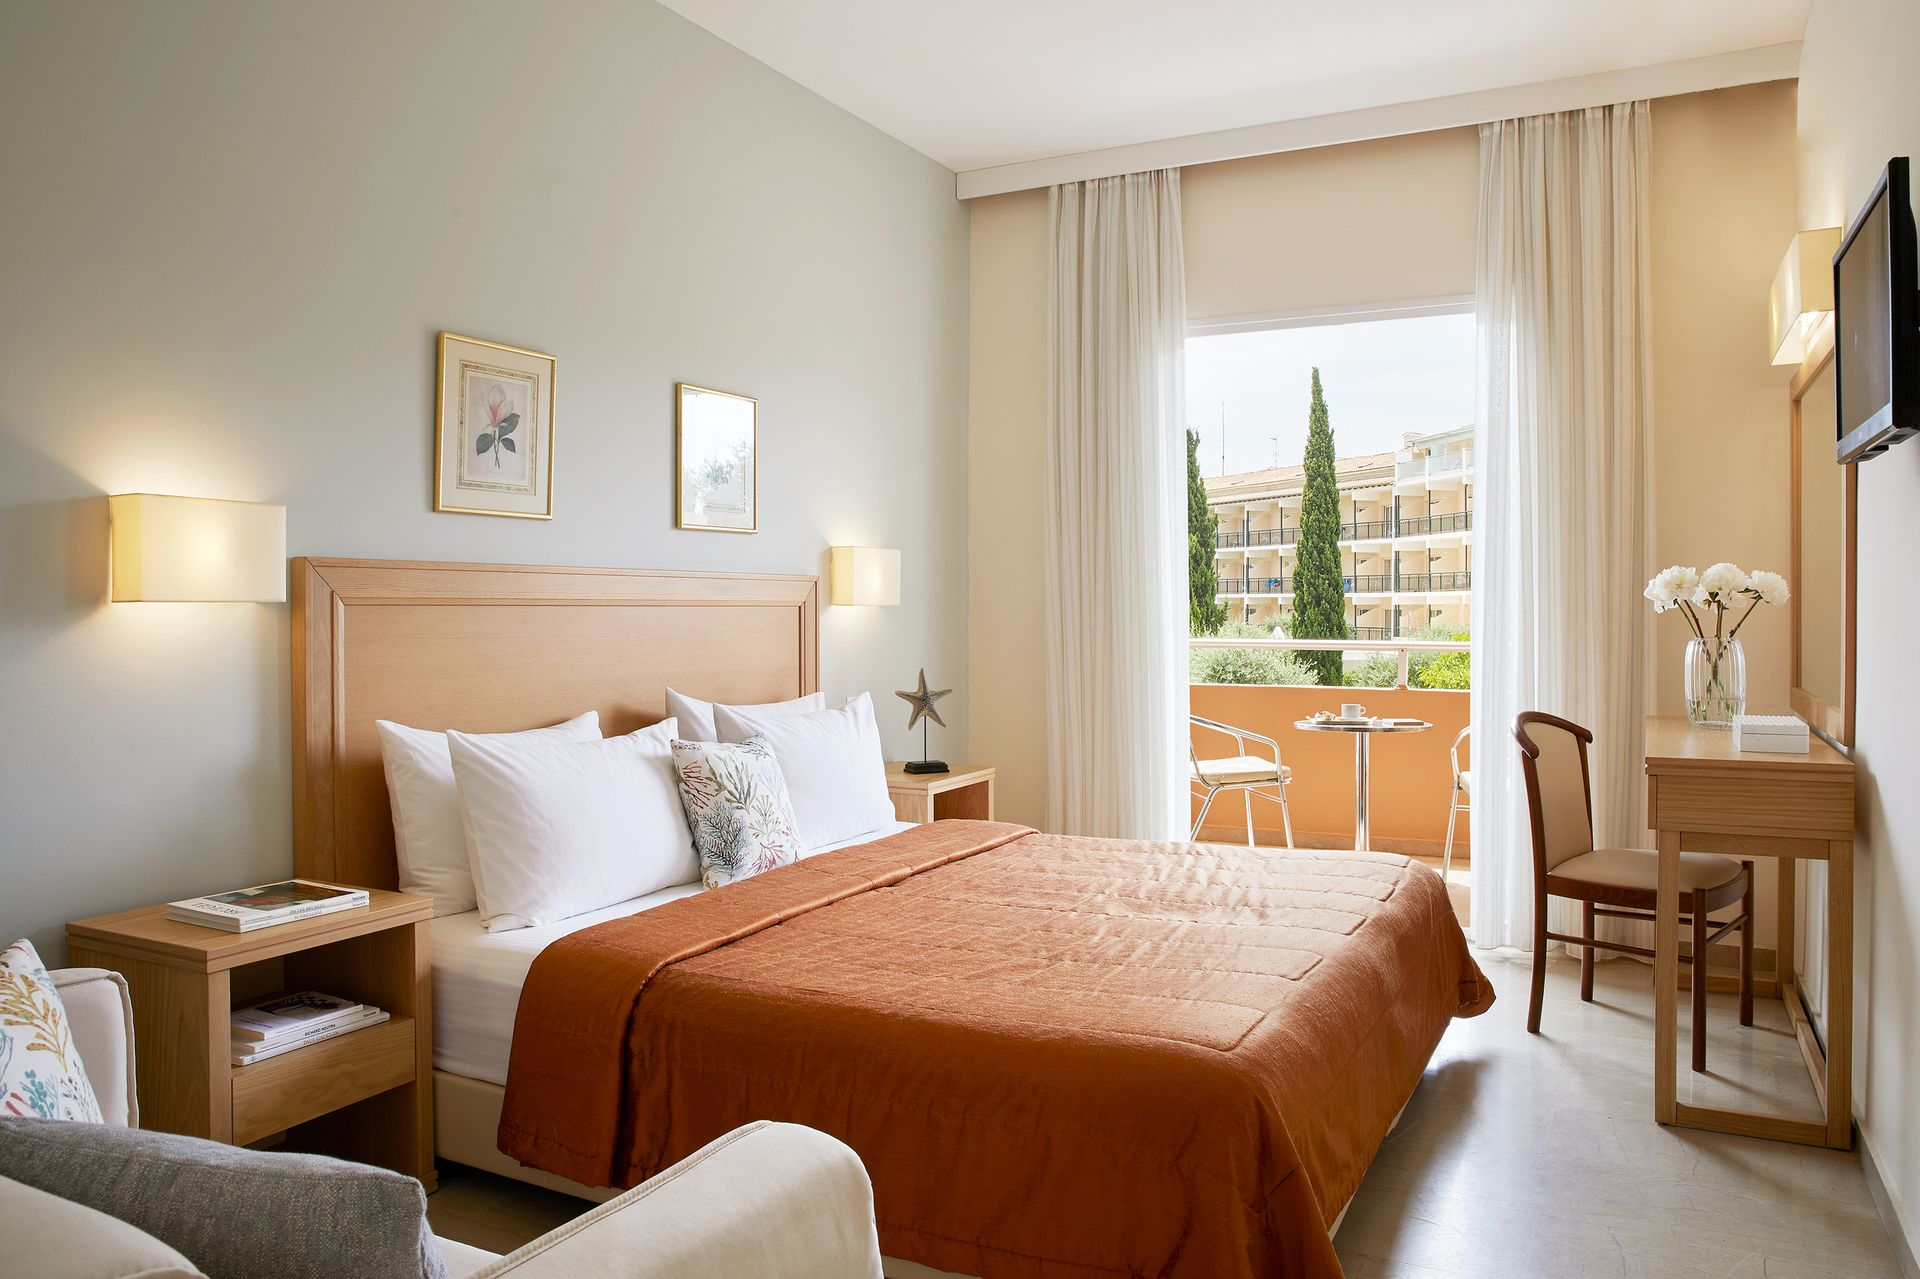 Standard Doppel-/Zweibettzimmer Gartenblick